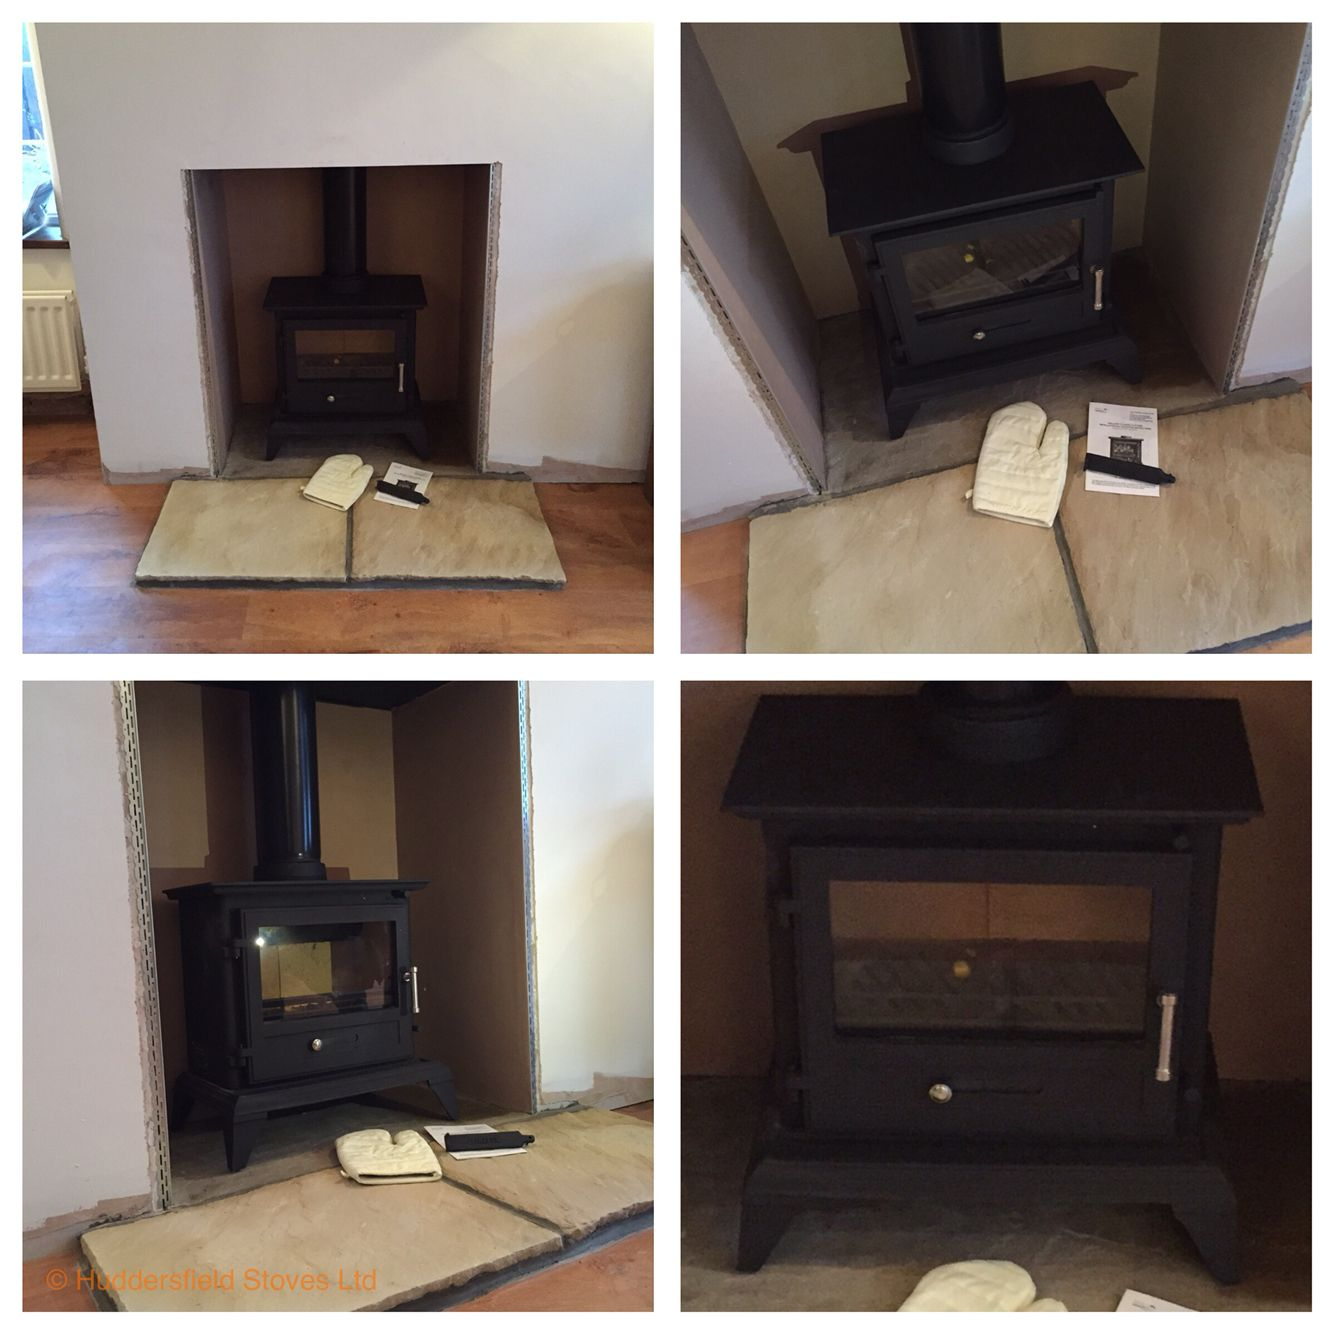 #Stove #installation #multifuel stove #woodburning stove #huddersfield #yorkshire #home #design #decor #living #chimney